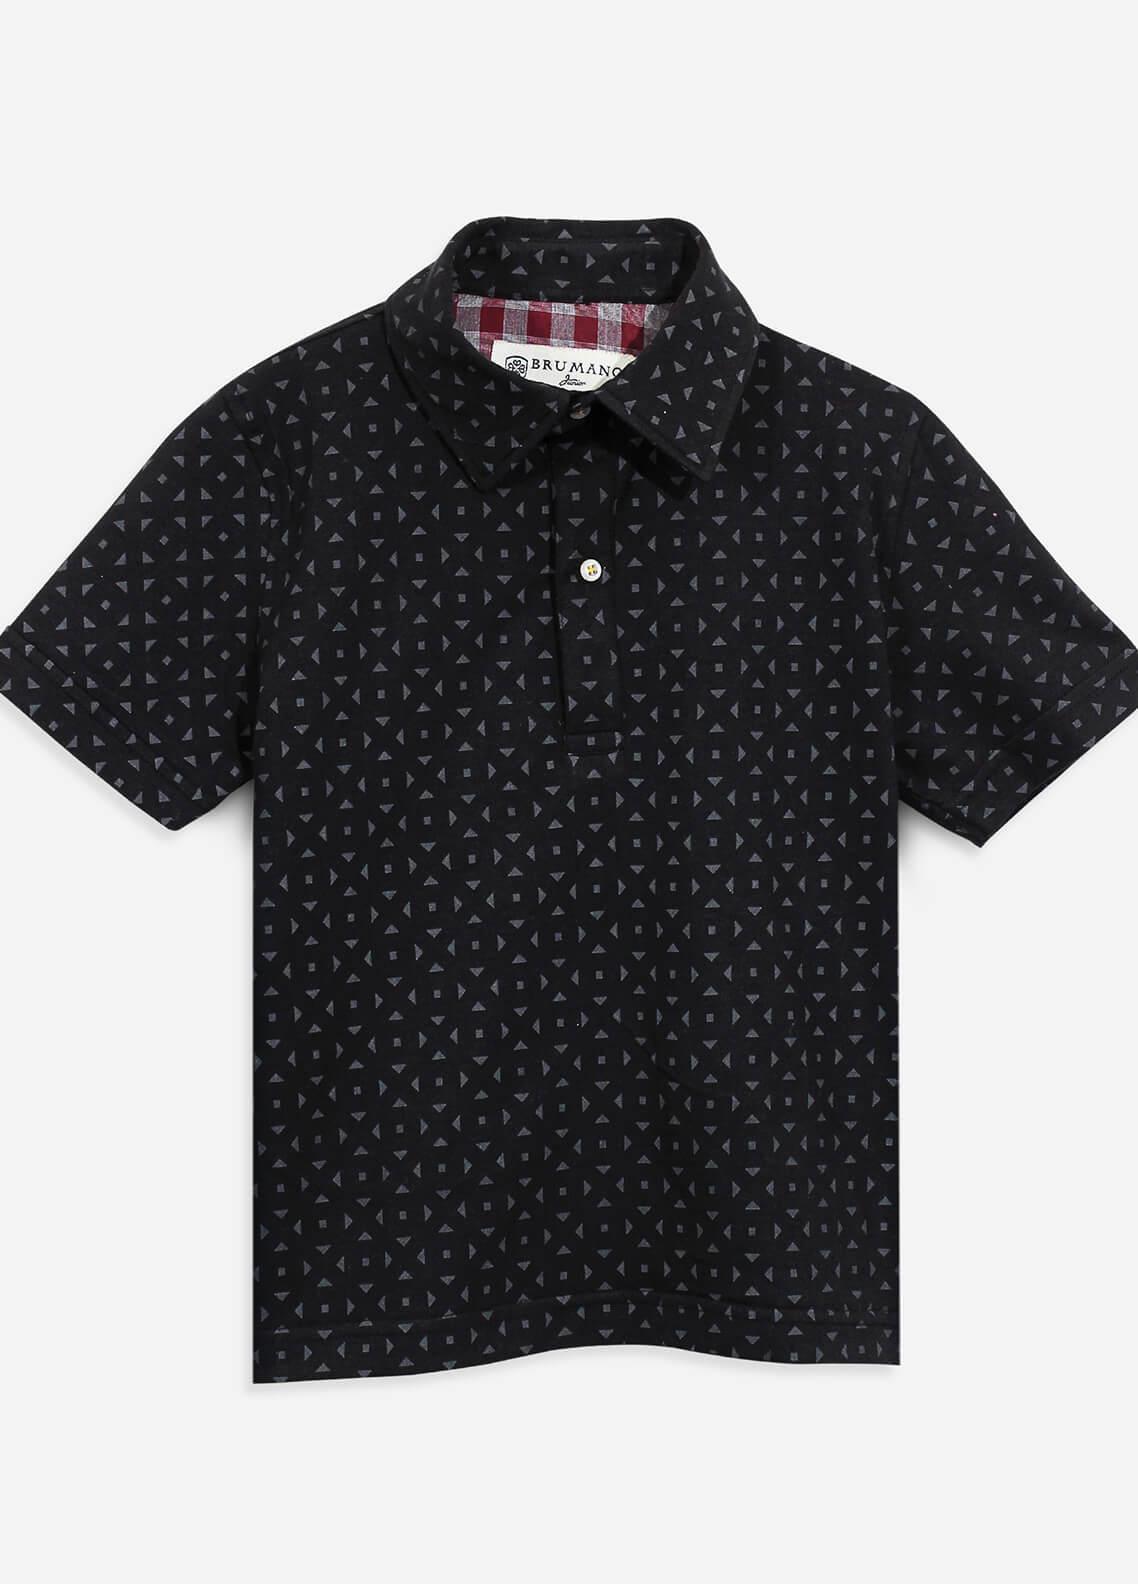 Brumano Cotton Polo Shirts for Boys - Black BRM-081